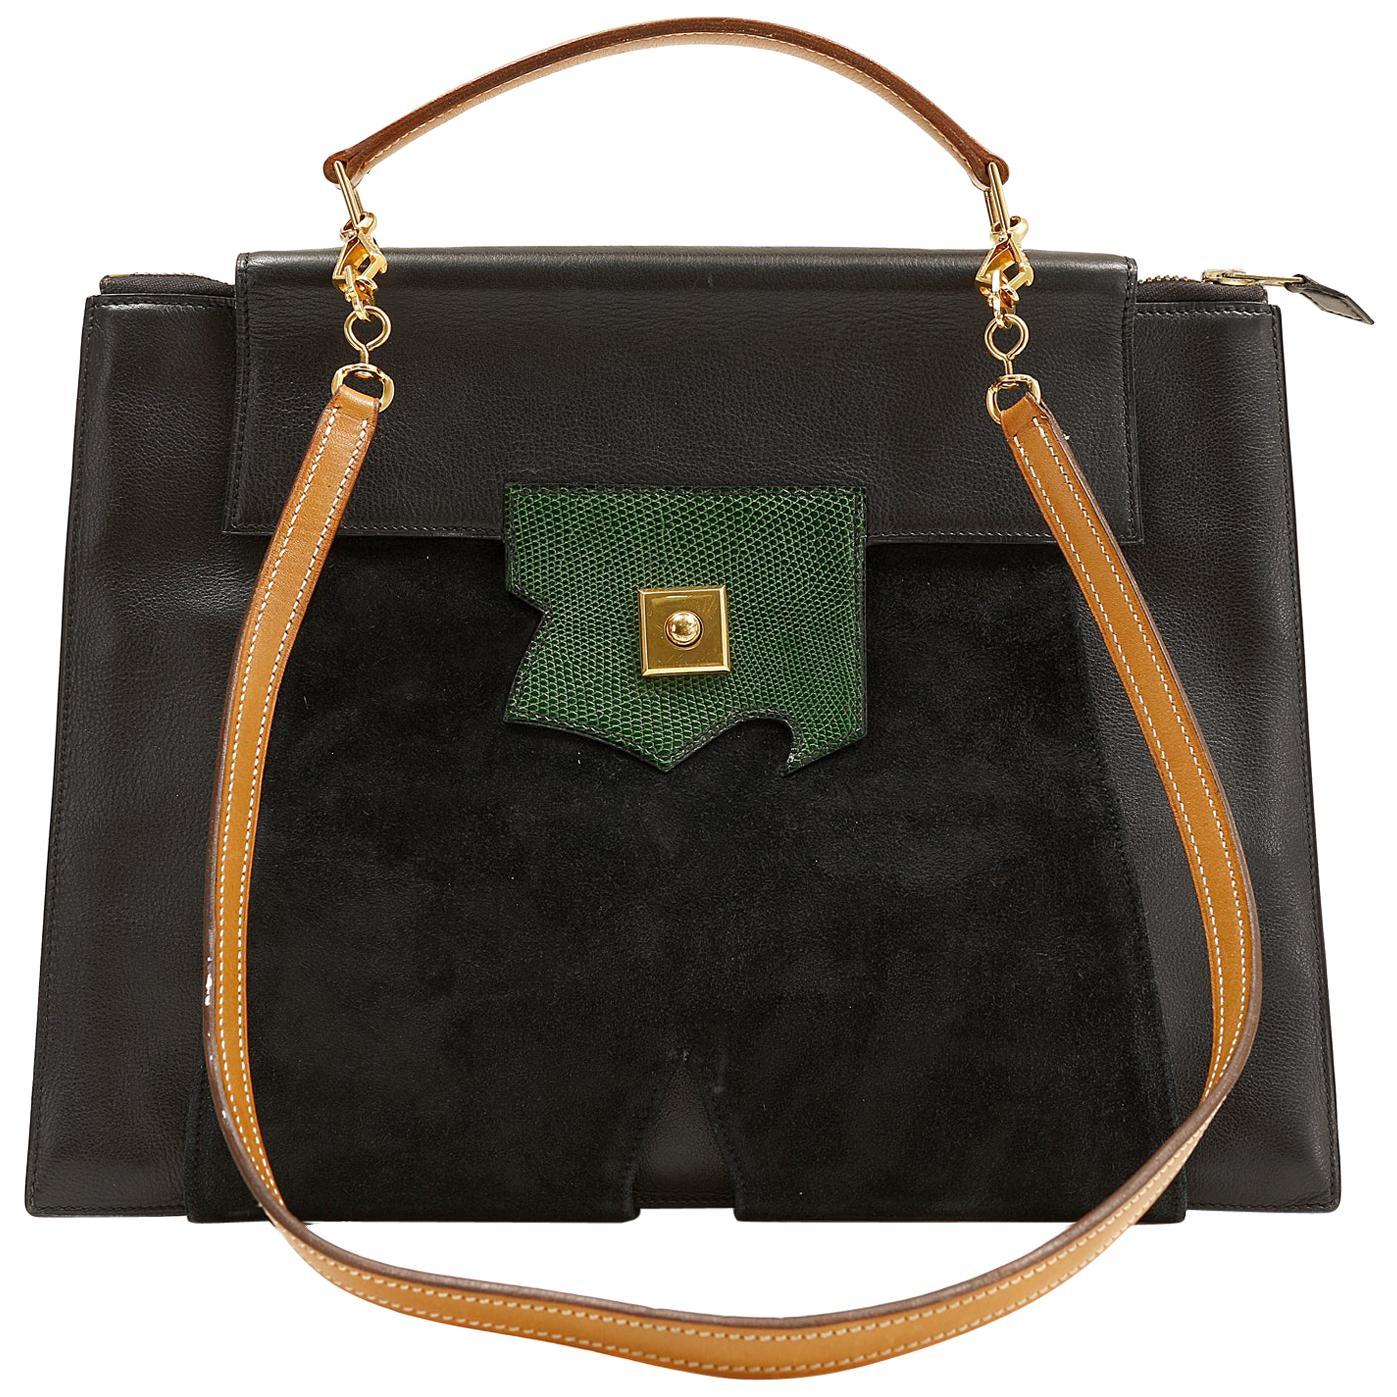 Hermès Black Leather, Suede and Lizard Brief Case